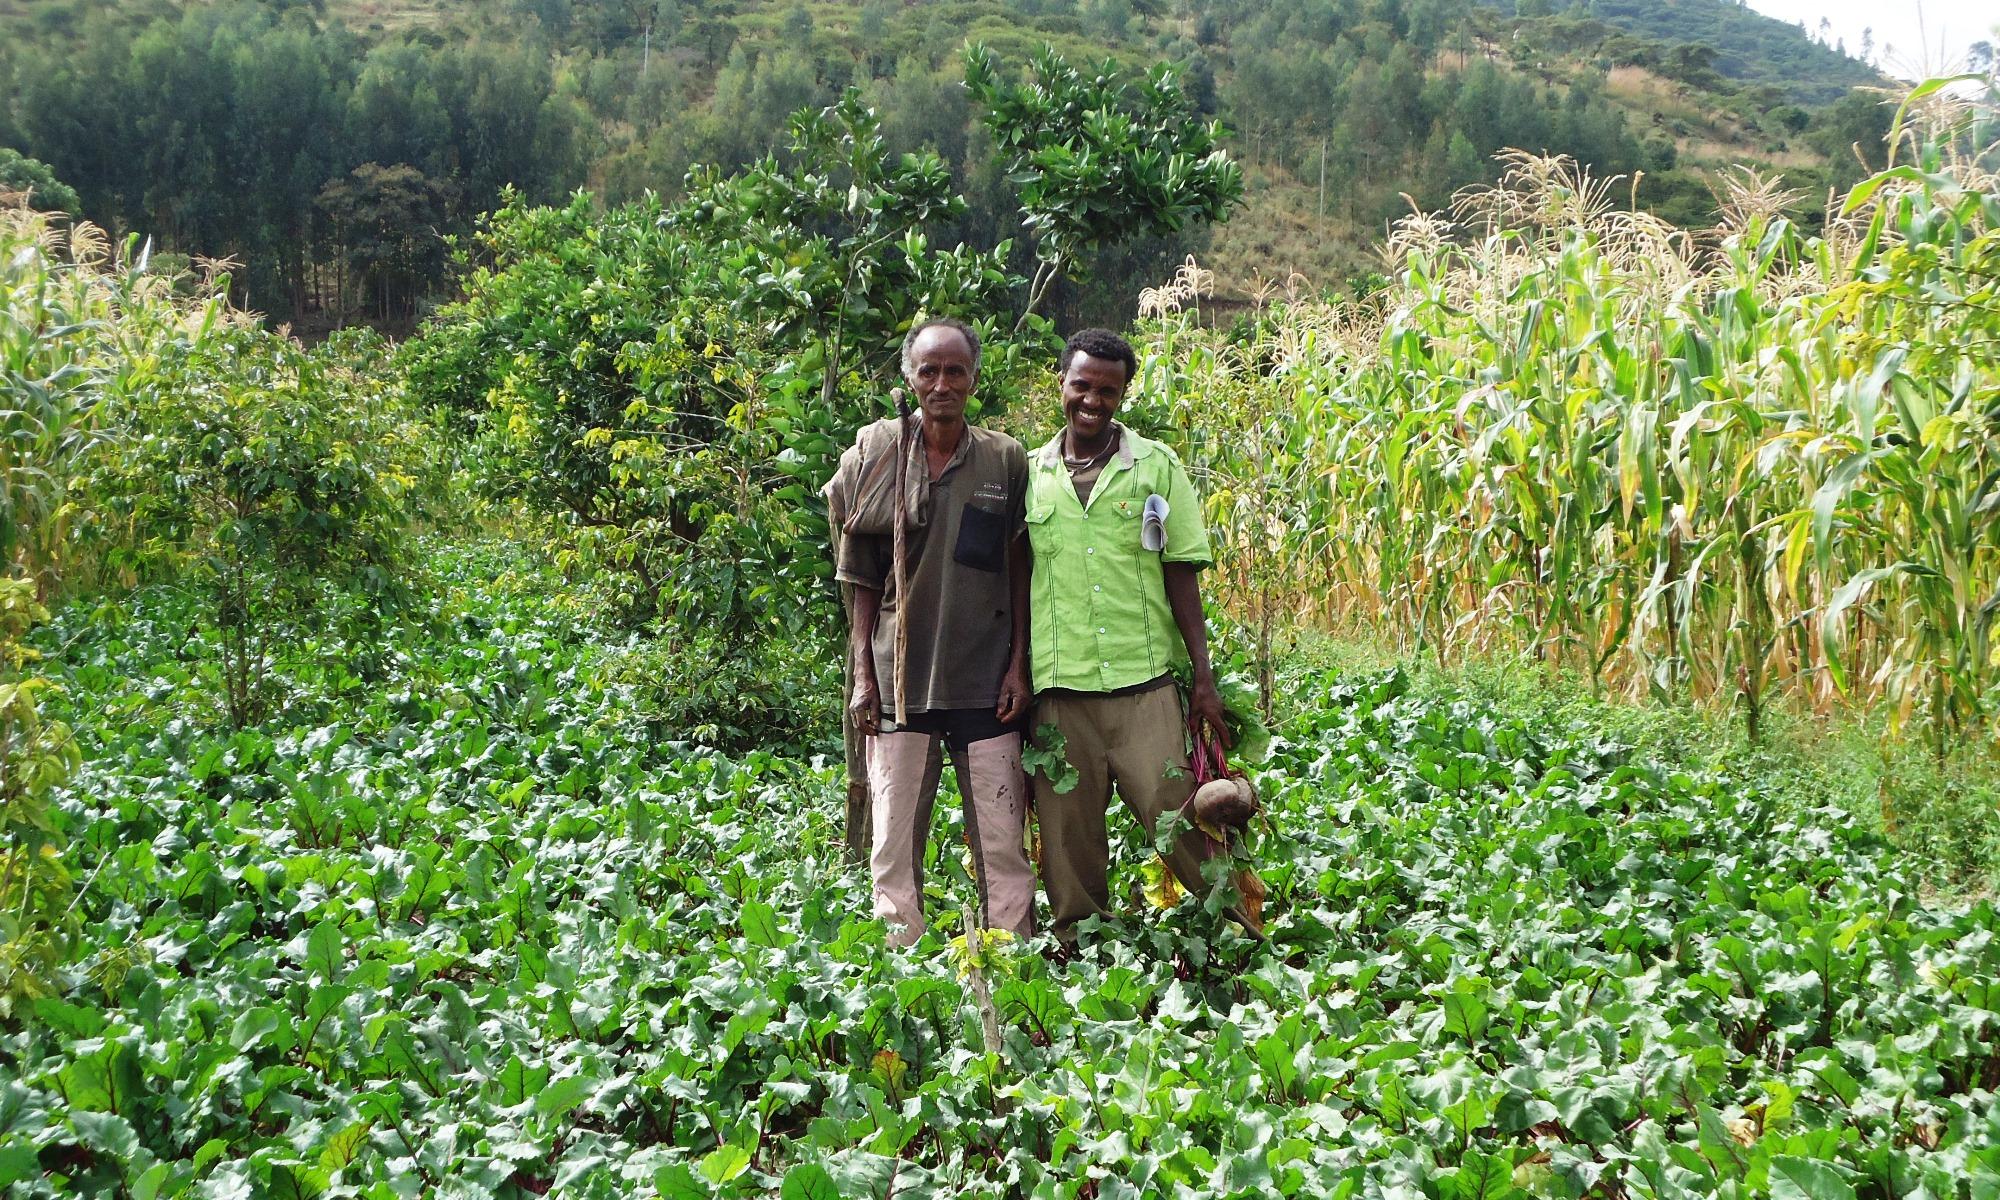 The rise of organic agriculture in Ethiopia - Pesticide